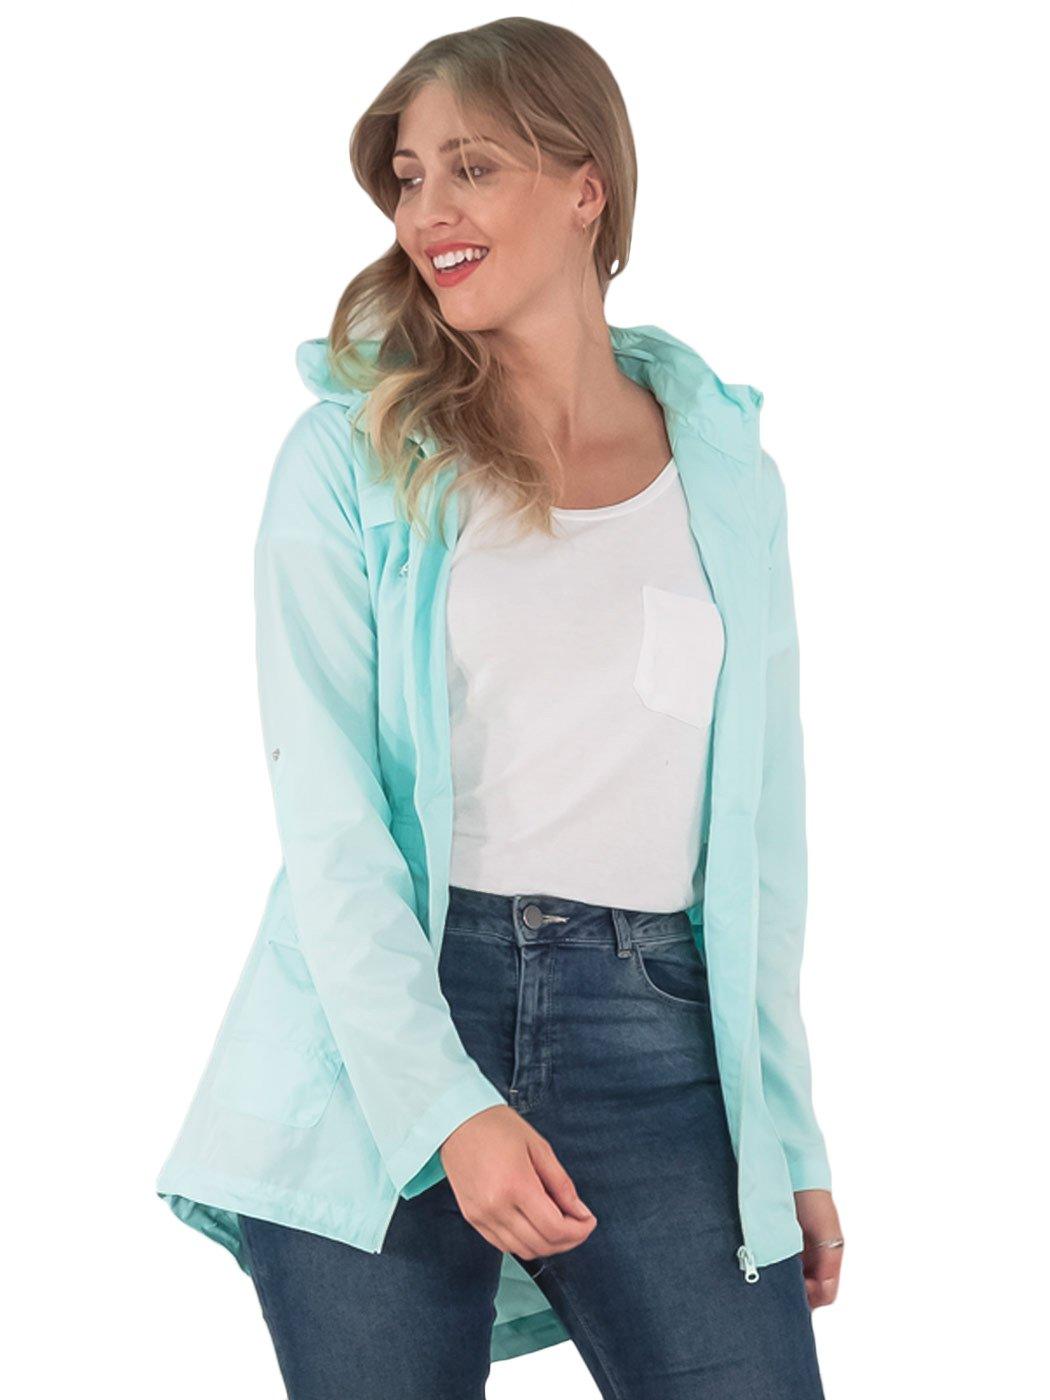 Womens-RainCoat-Plain-Hooded-Ladies-Jacket-Kagool-Parka-Long-Sleeves-Two-Pockets thumbnail 13